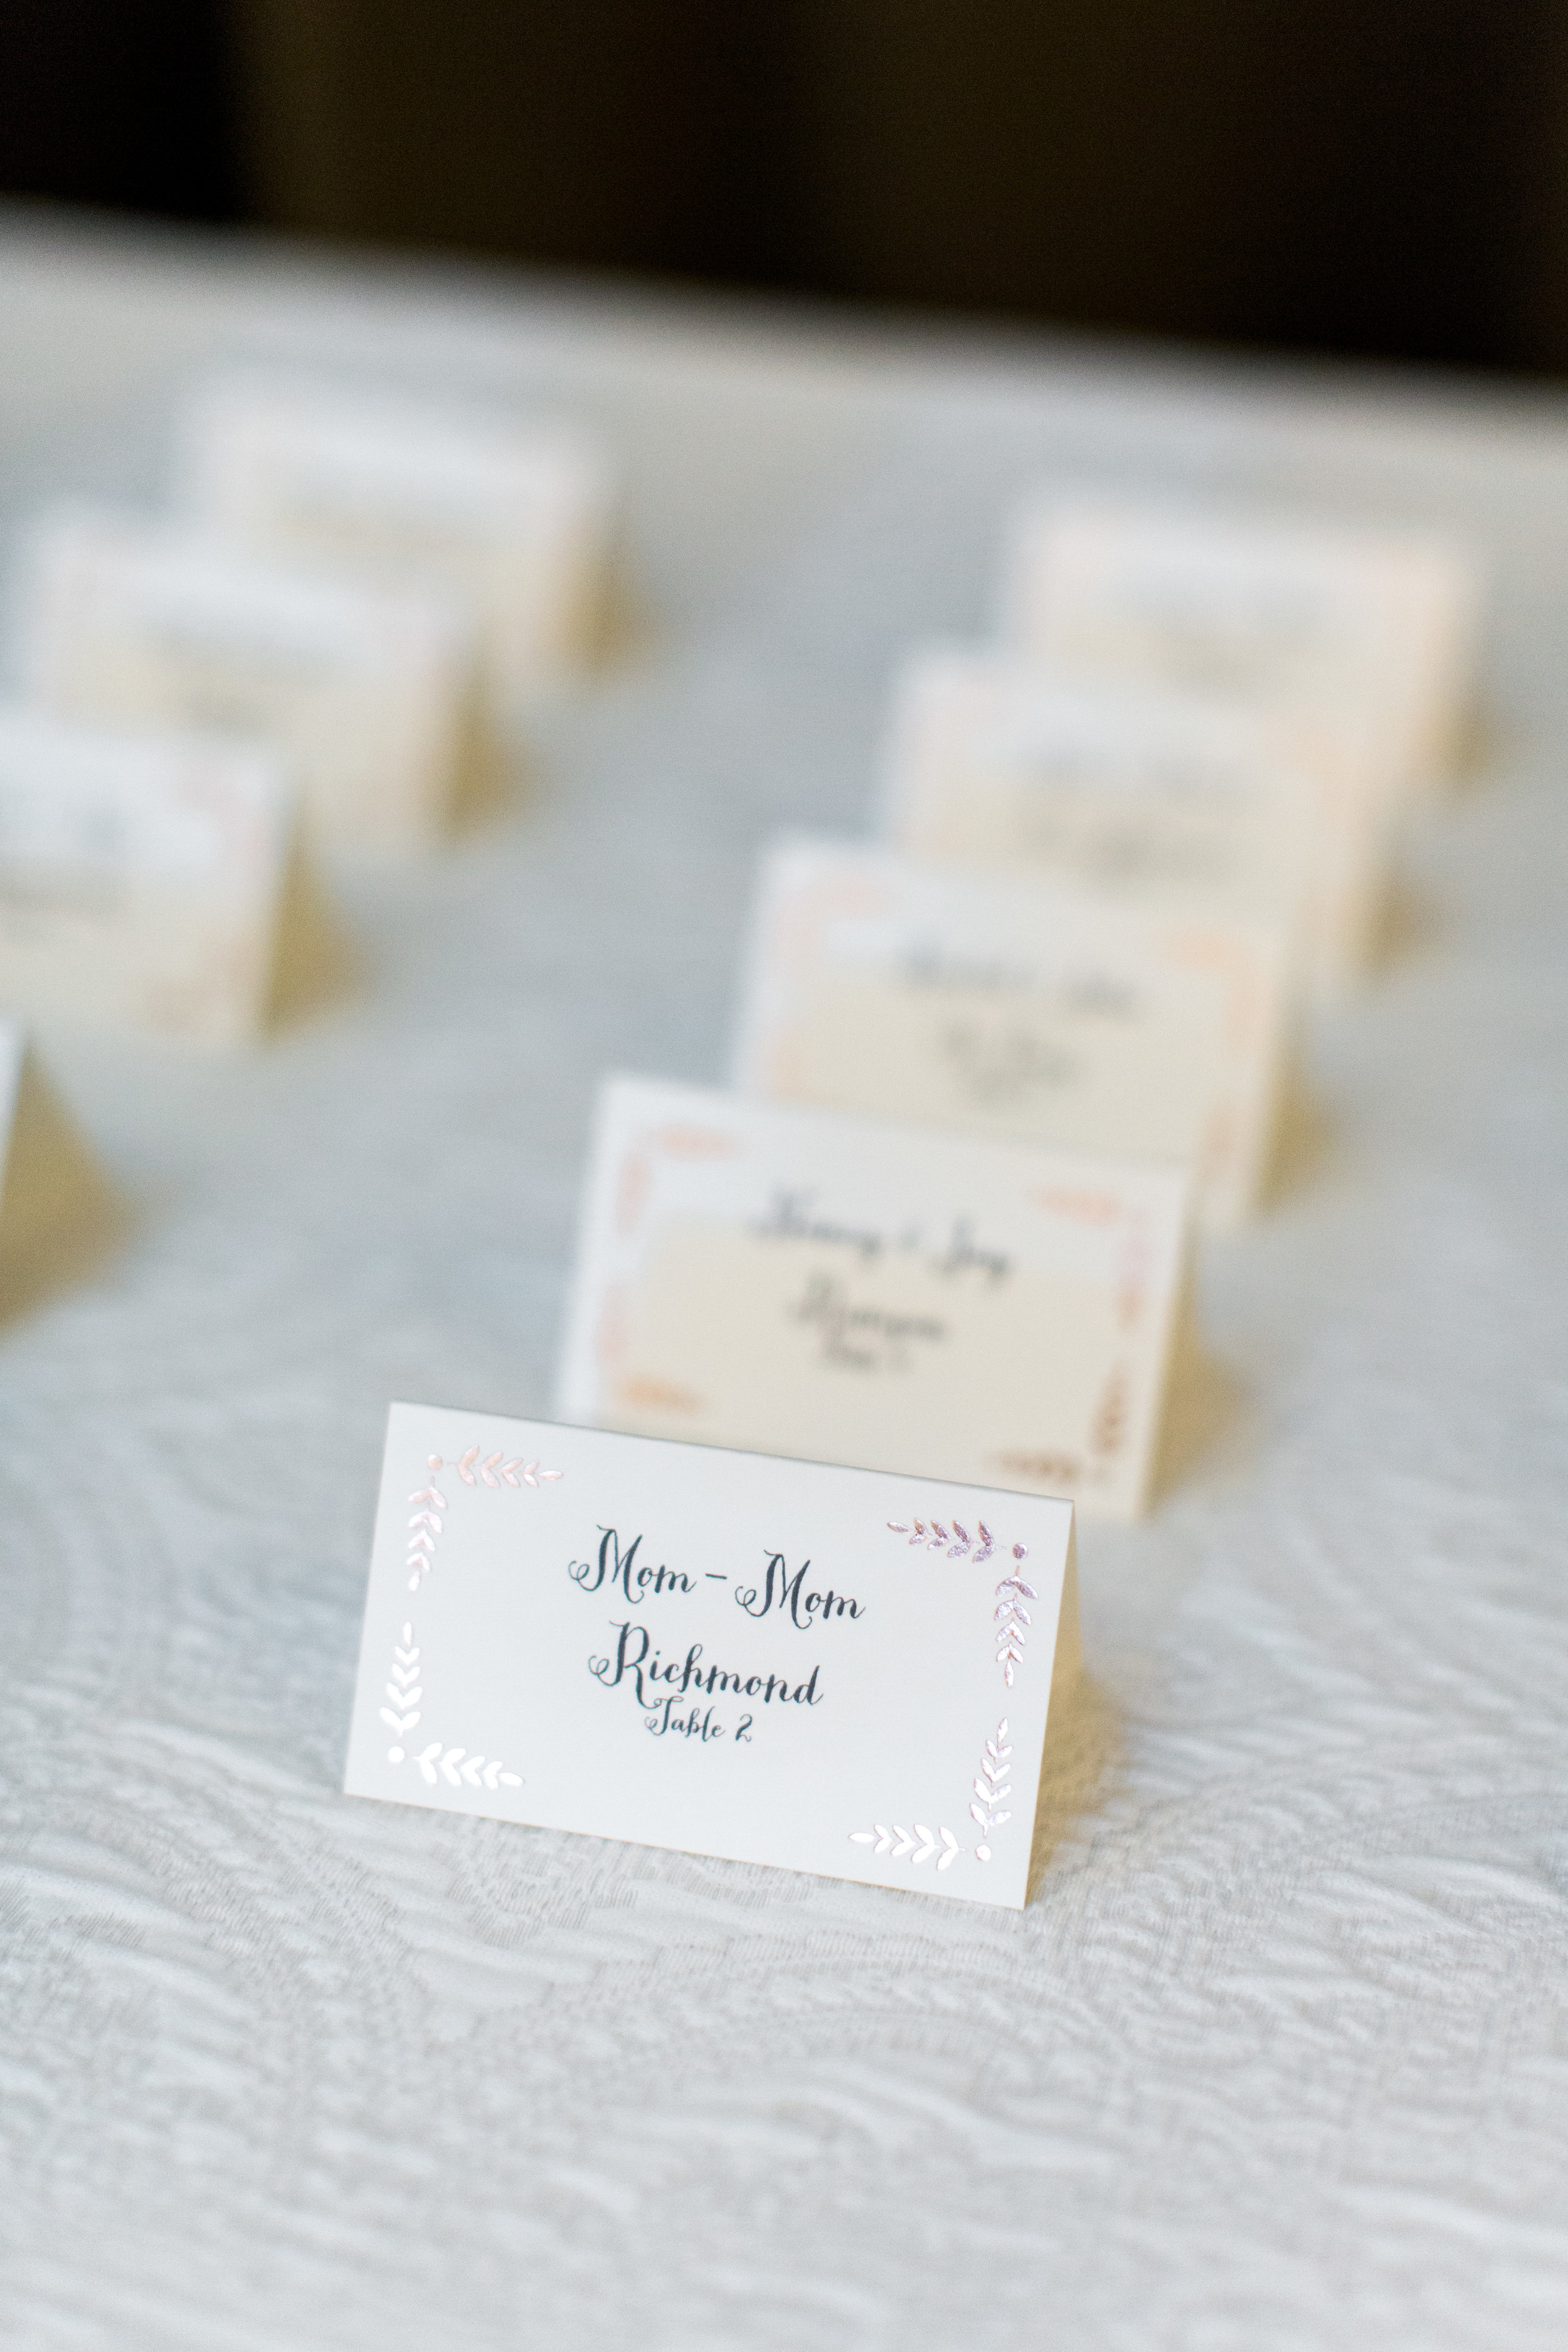 intimate-wedding-at-solage-calistoga-in-napa-47.jpg